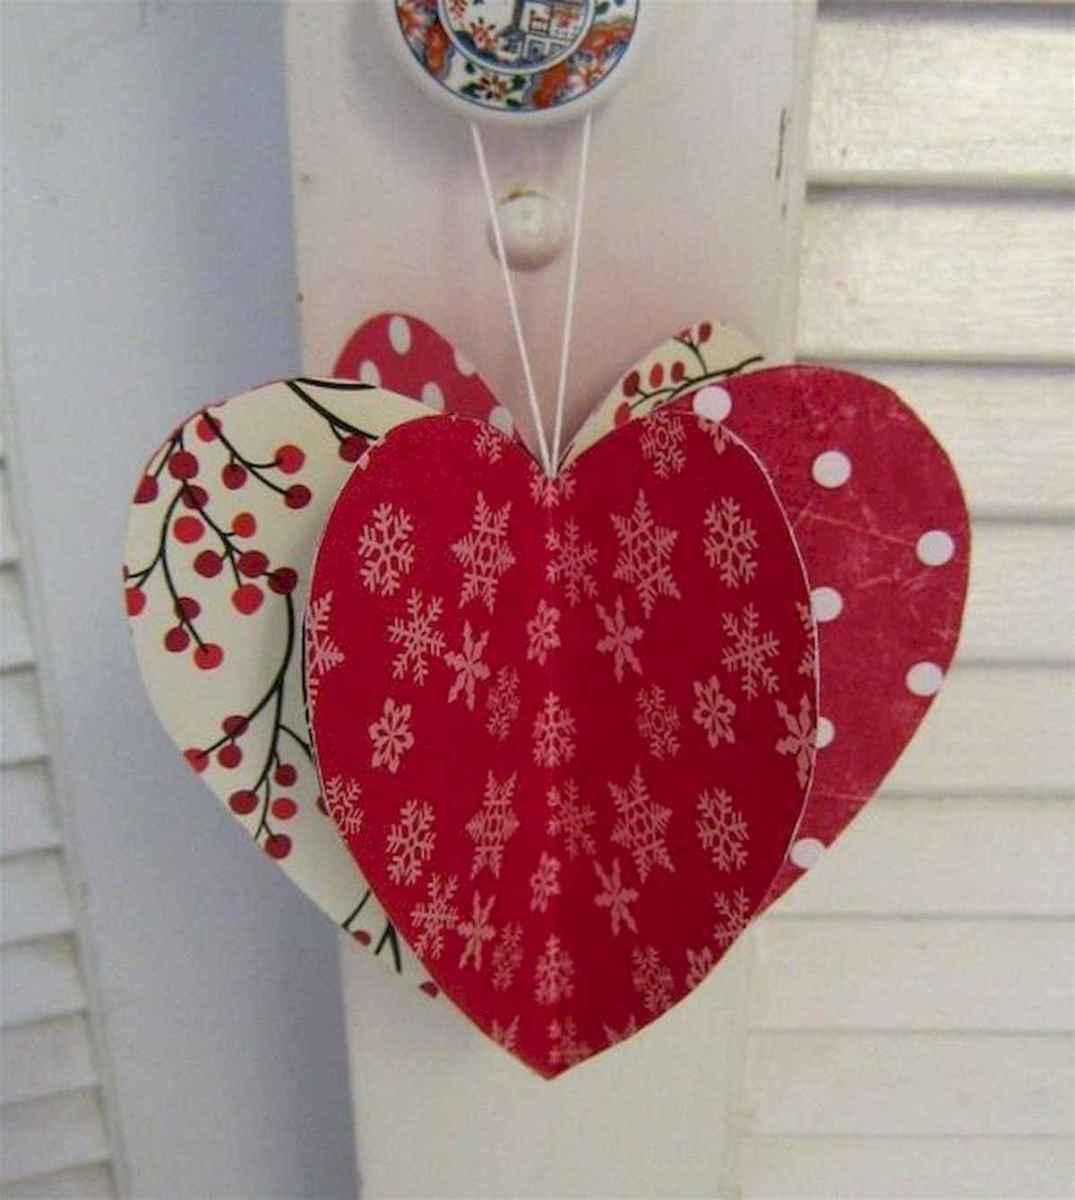 75 lovely valentines day crafts design ideas (70)